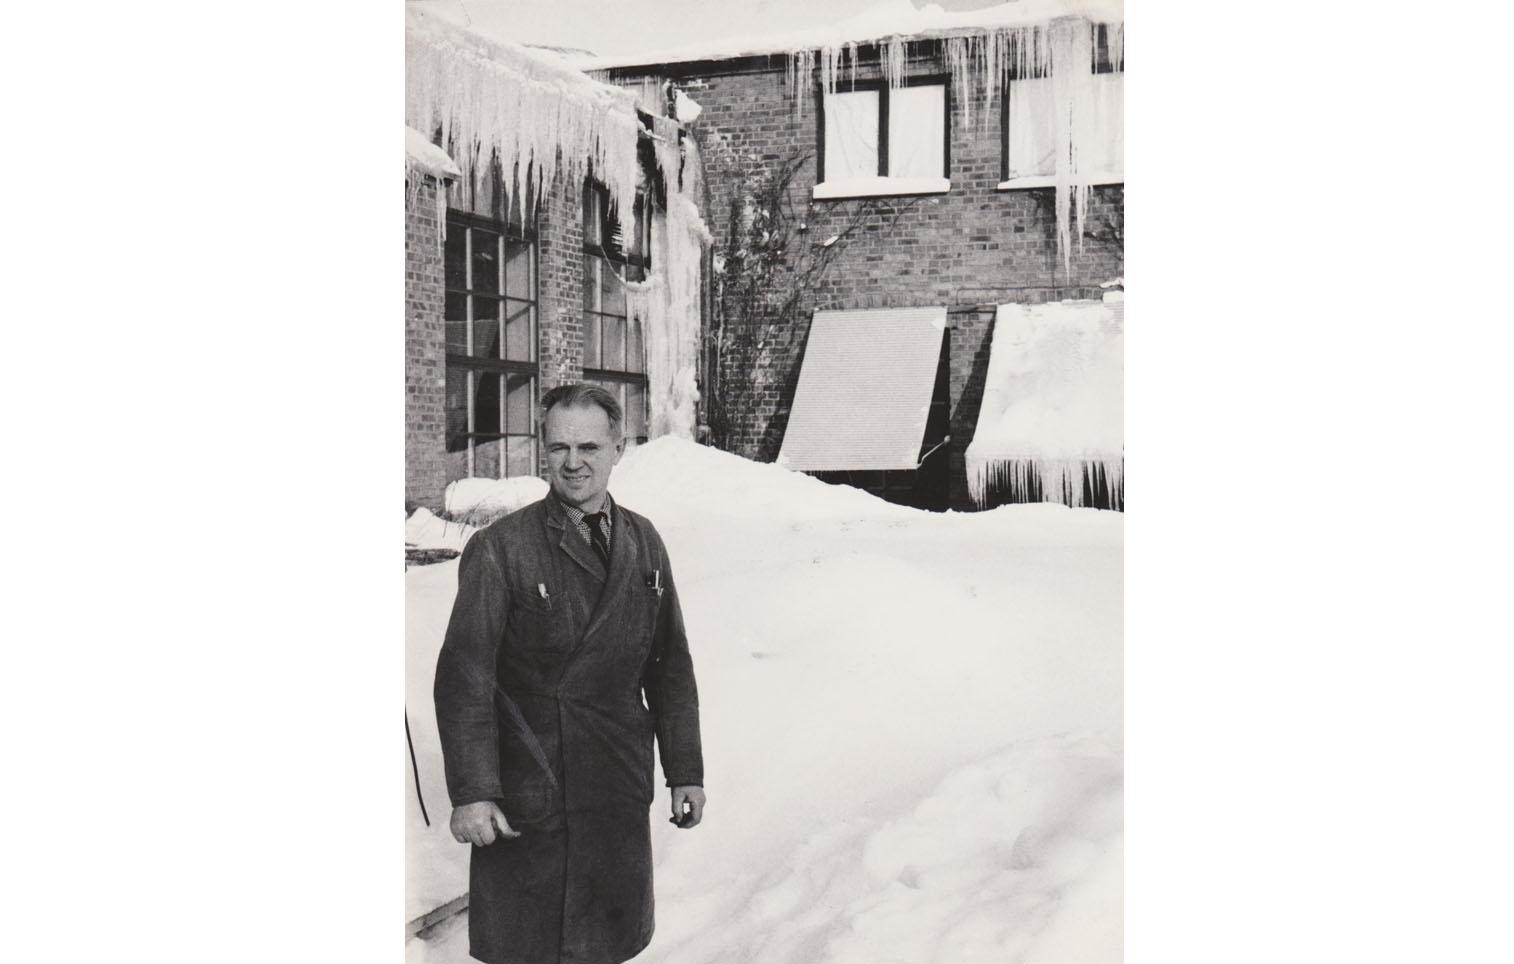 Arbetsledare Alf Sundberg, 8 feb 1945, -32°